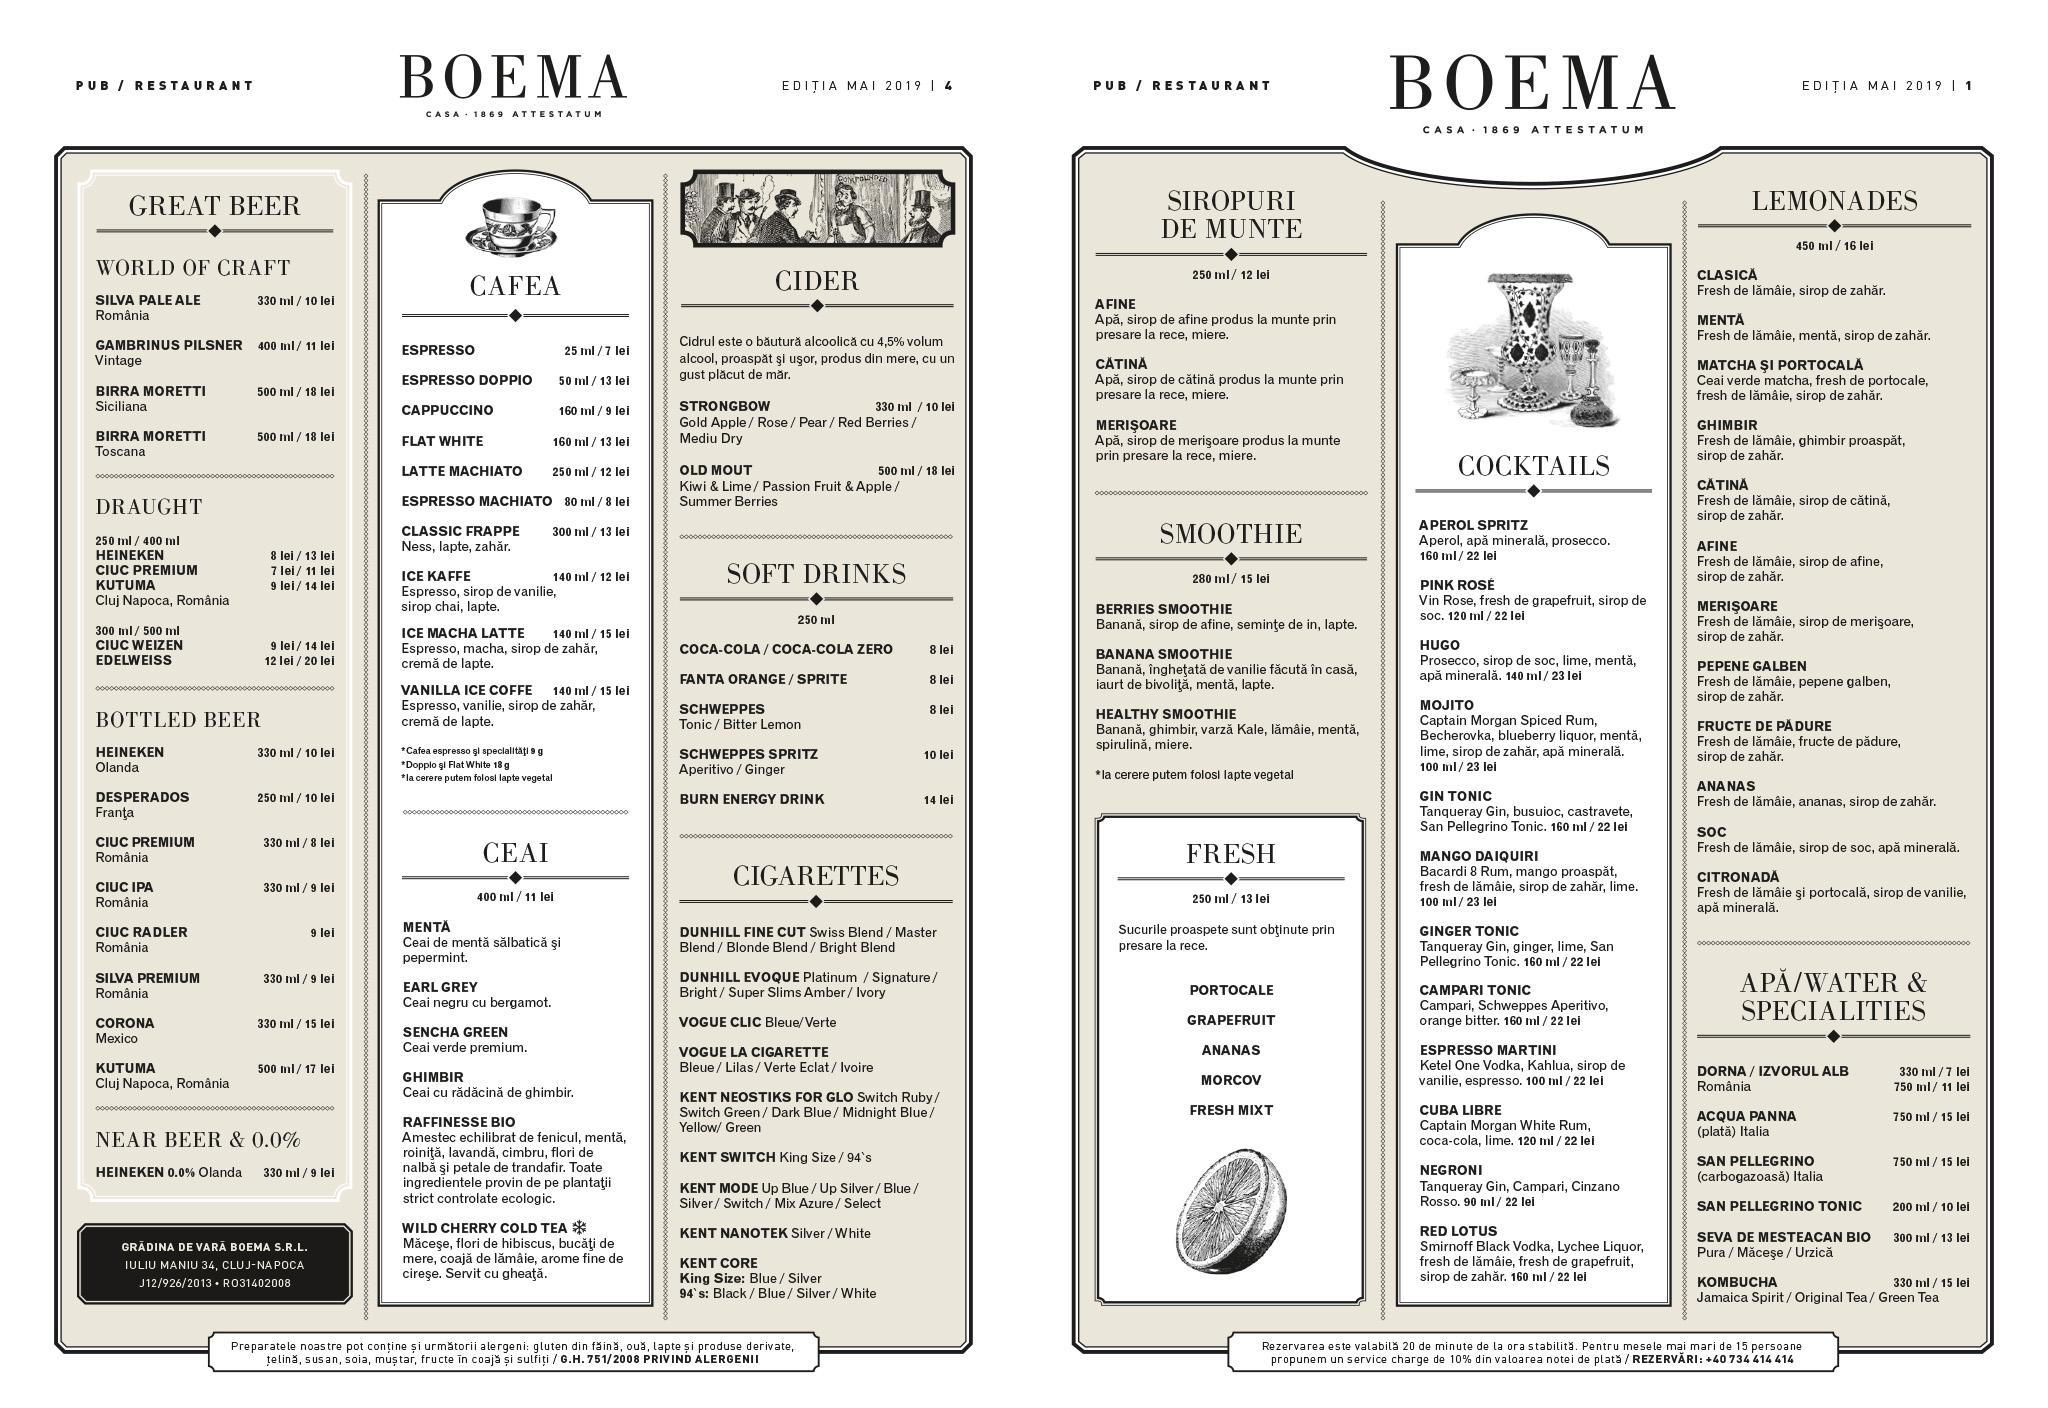 restaurant-cluj-napoca-casa-boema-meniu-bautura-2019-vara-1